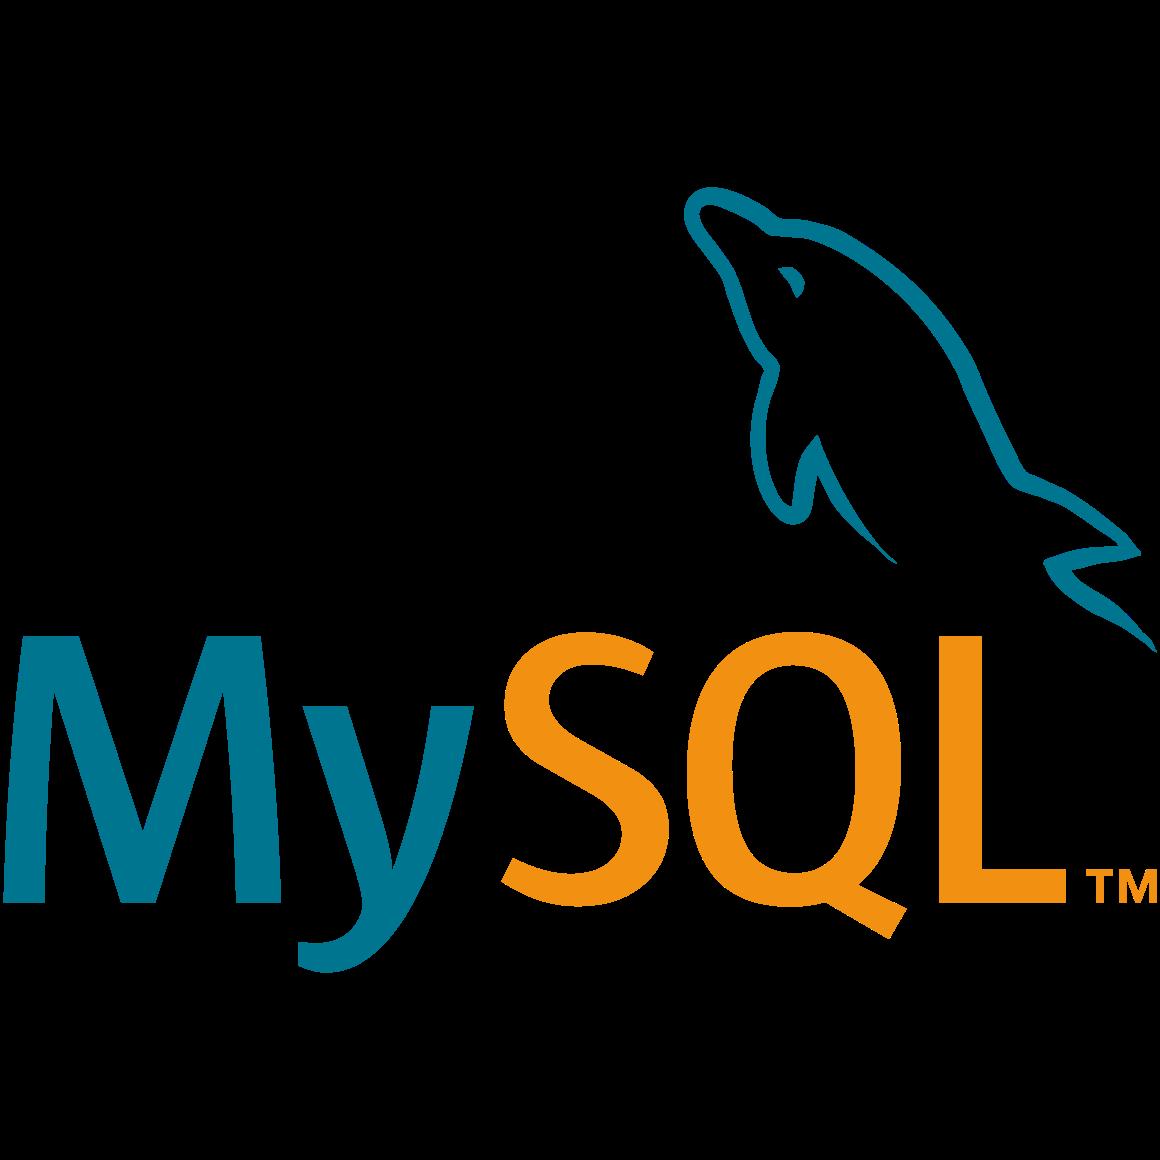 nodetypes/http%3A%2F%2Fdch.uni-koeln.de%2Ftosca%2Fnodetypes/MySQL-DBMS_5.7.26-w1-wip1/appearance/smallIcon.png